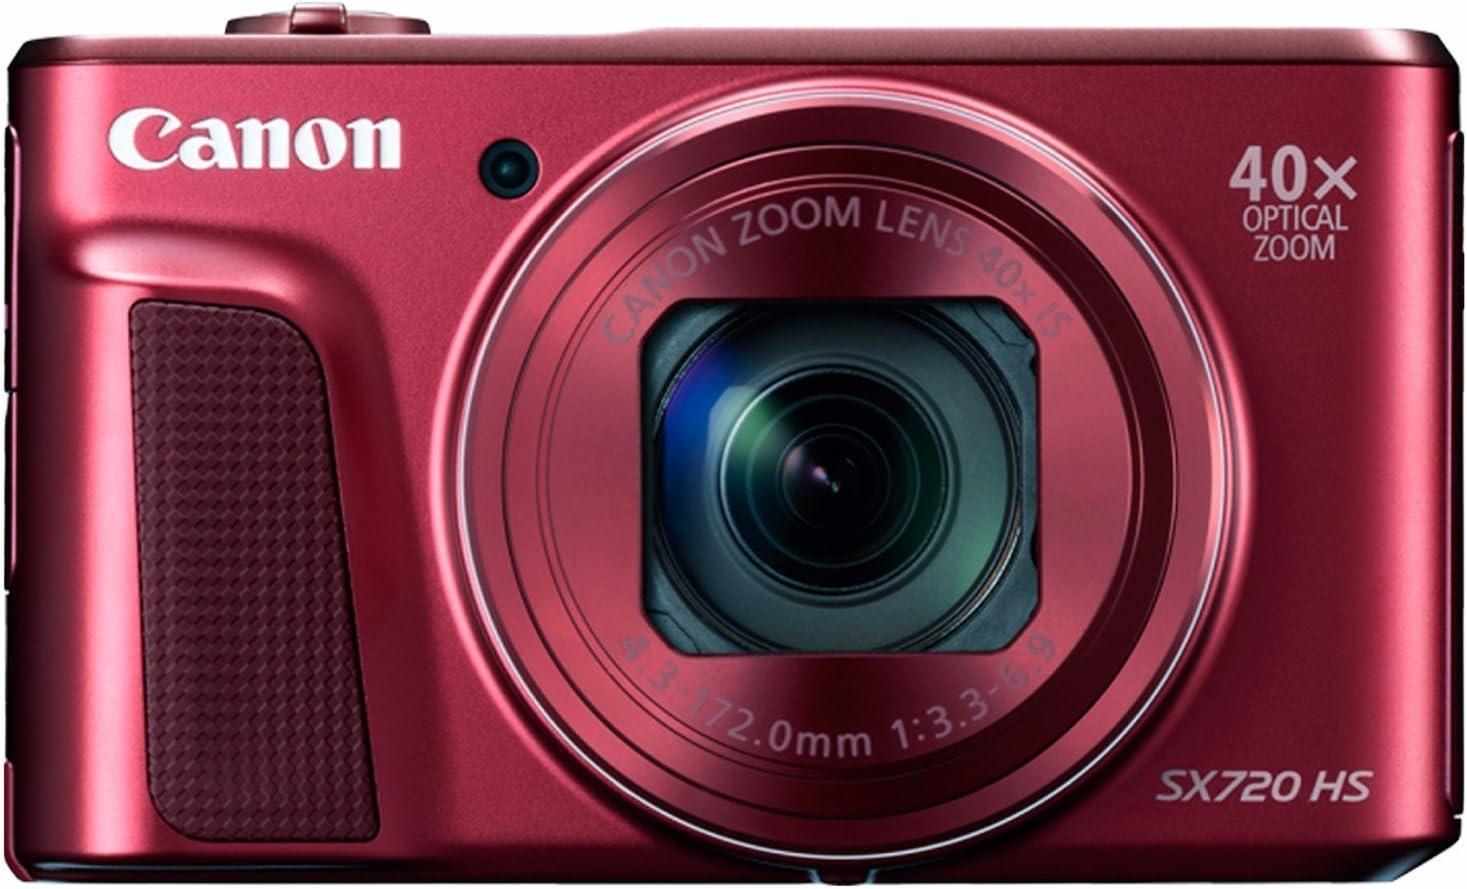 Canon PowerShot SX720 HS Renewed Red Branded goods Digital Camera Seasonal Wrap Introduction